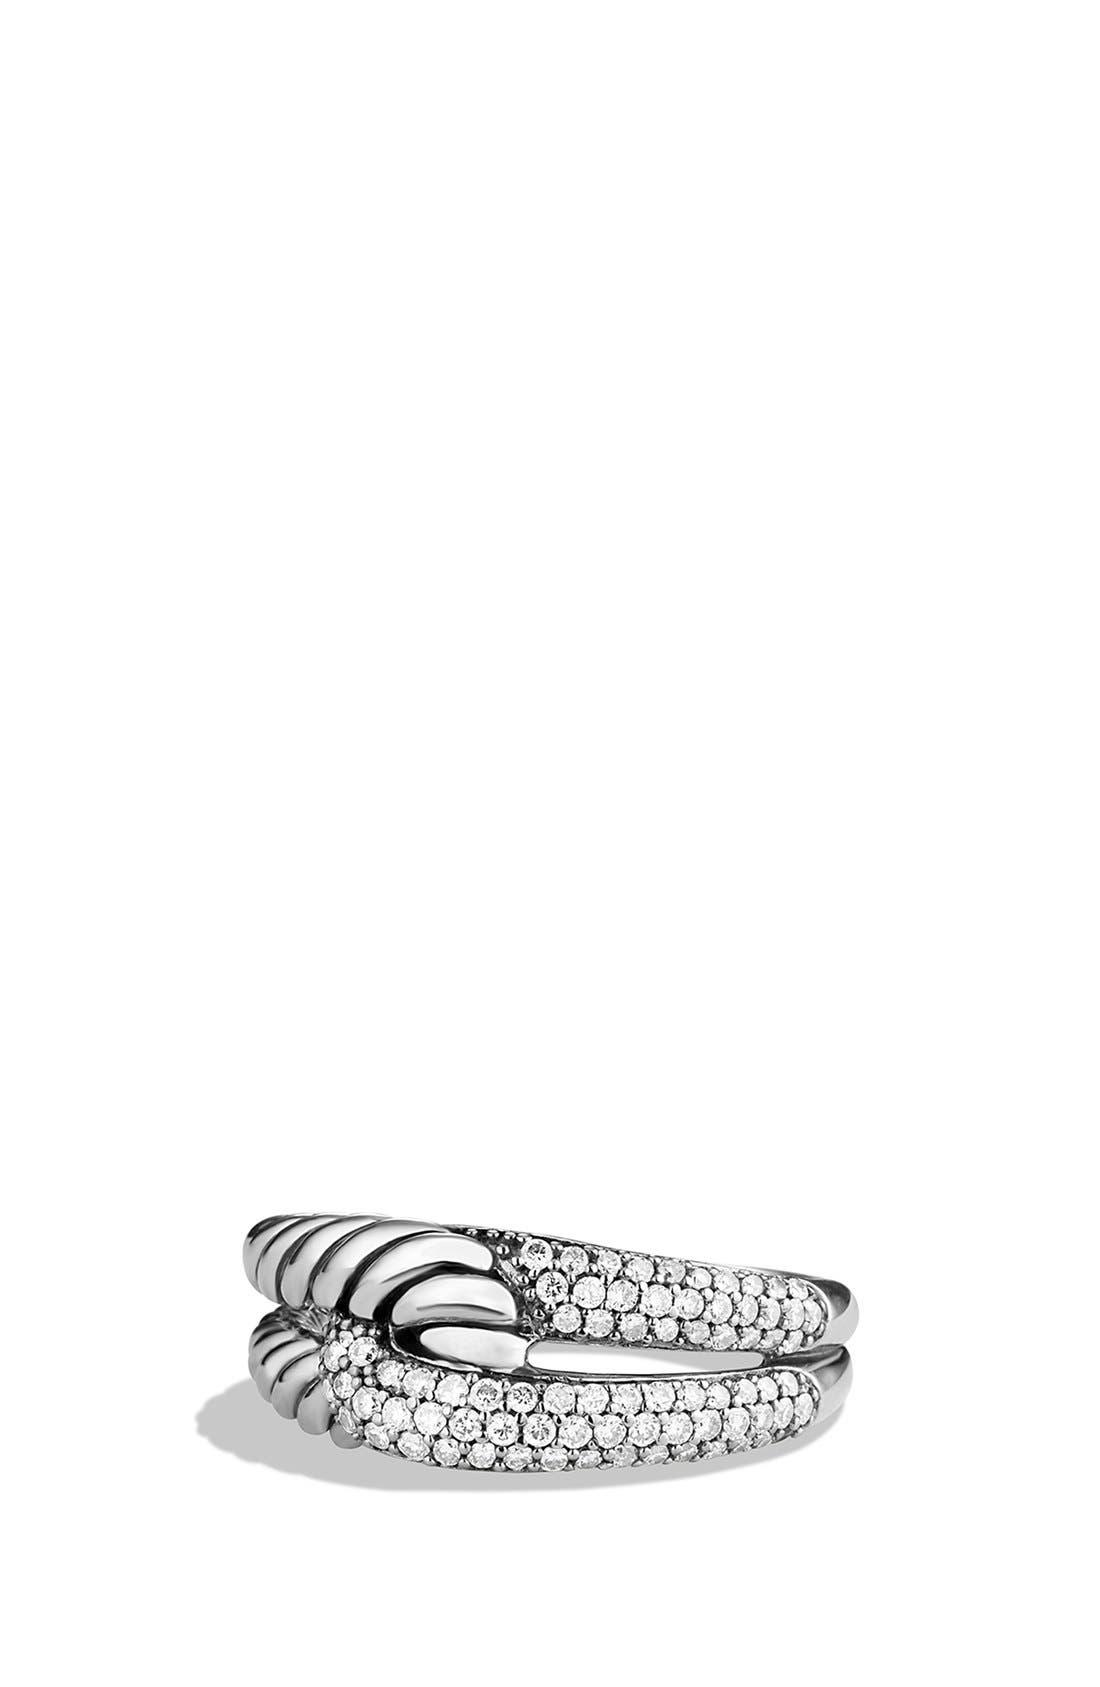 Main Image - David Yurman 'Labyrinth' Single Loop Ring with Diamonds